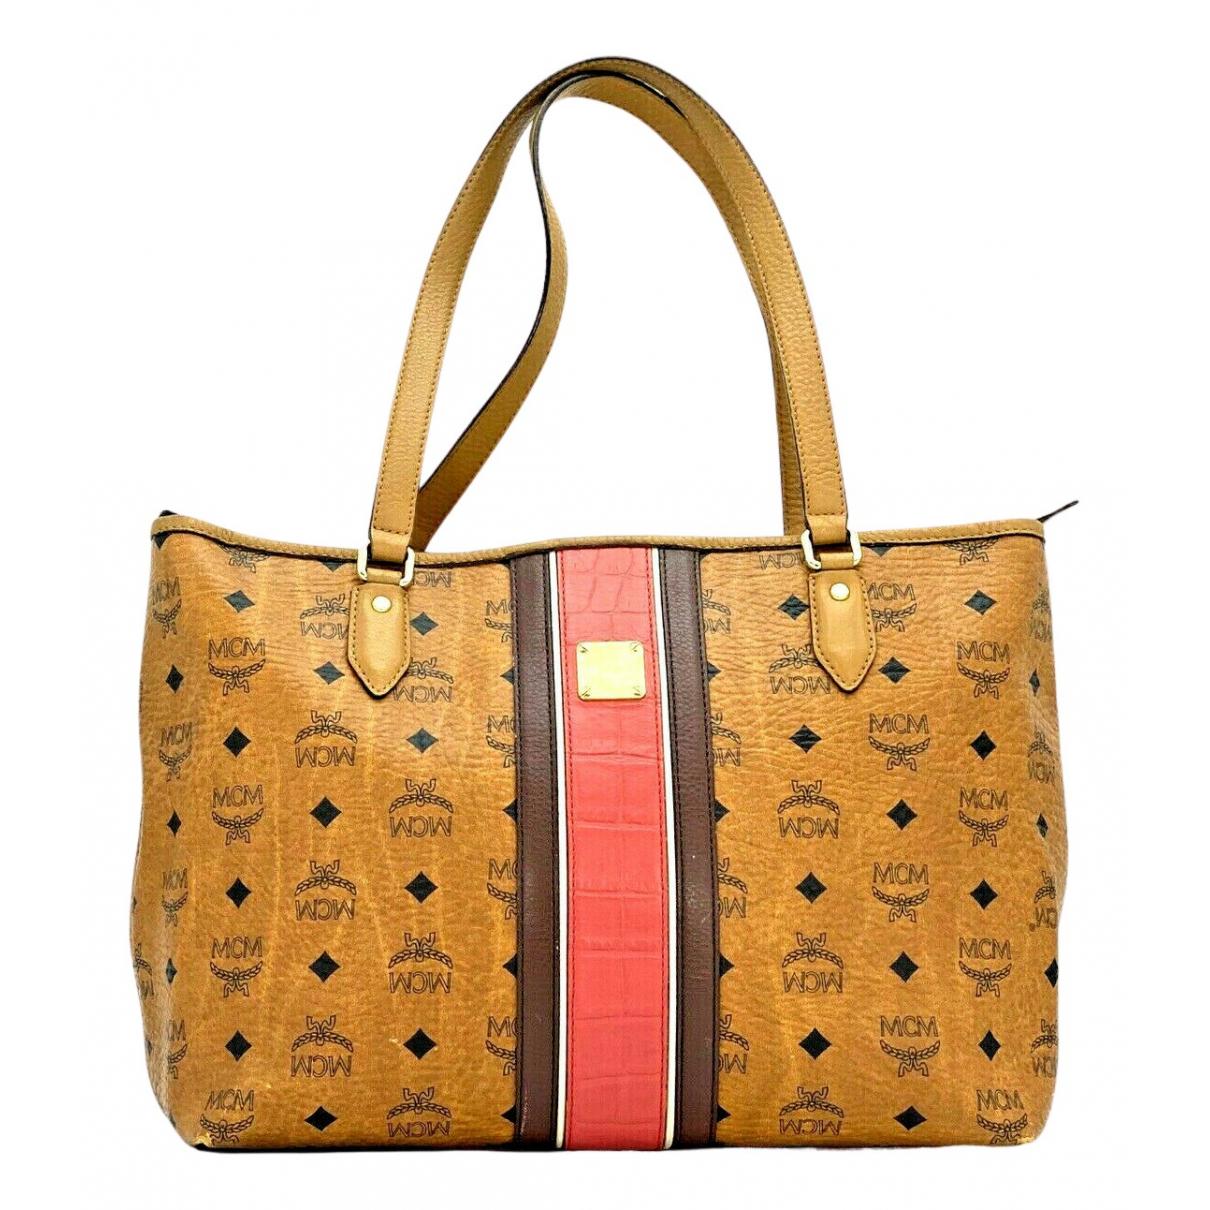 Mcm N Camel Leather handbag for Women N